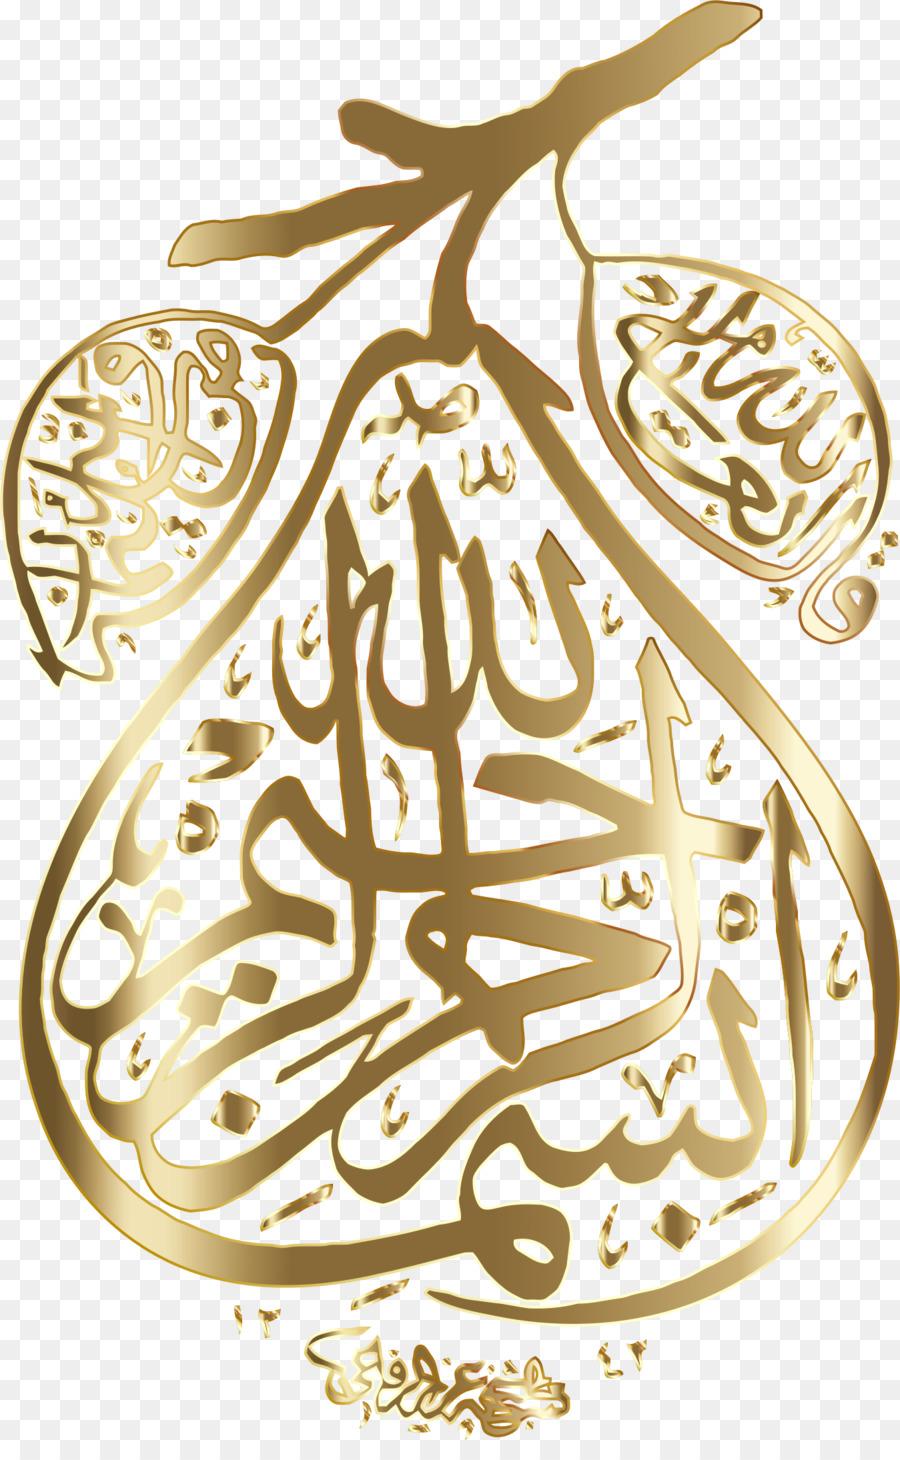 God in Islam Arabic calligraphy Salah - islamic png download - 1349 ...